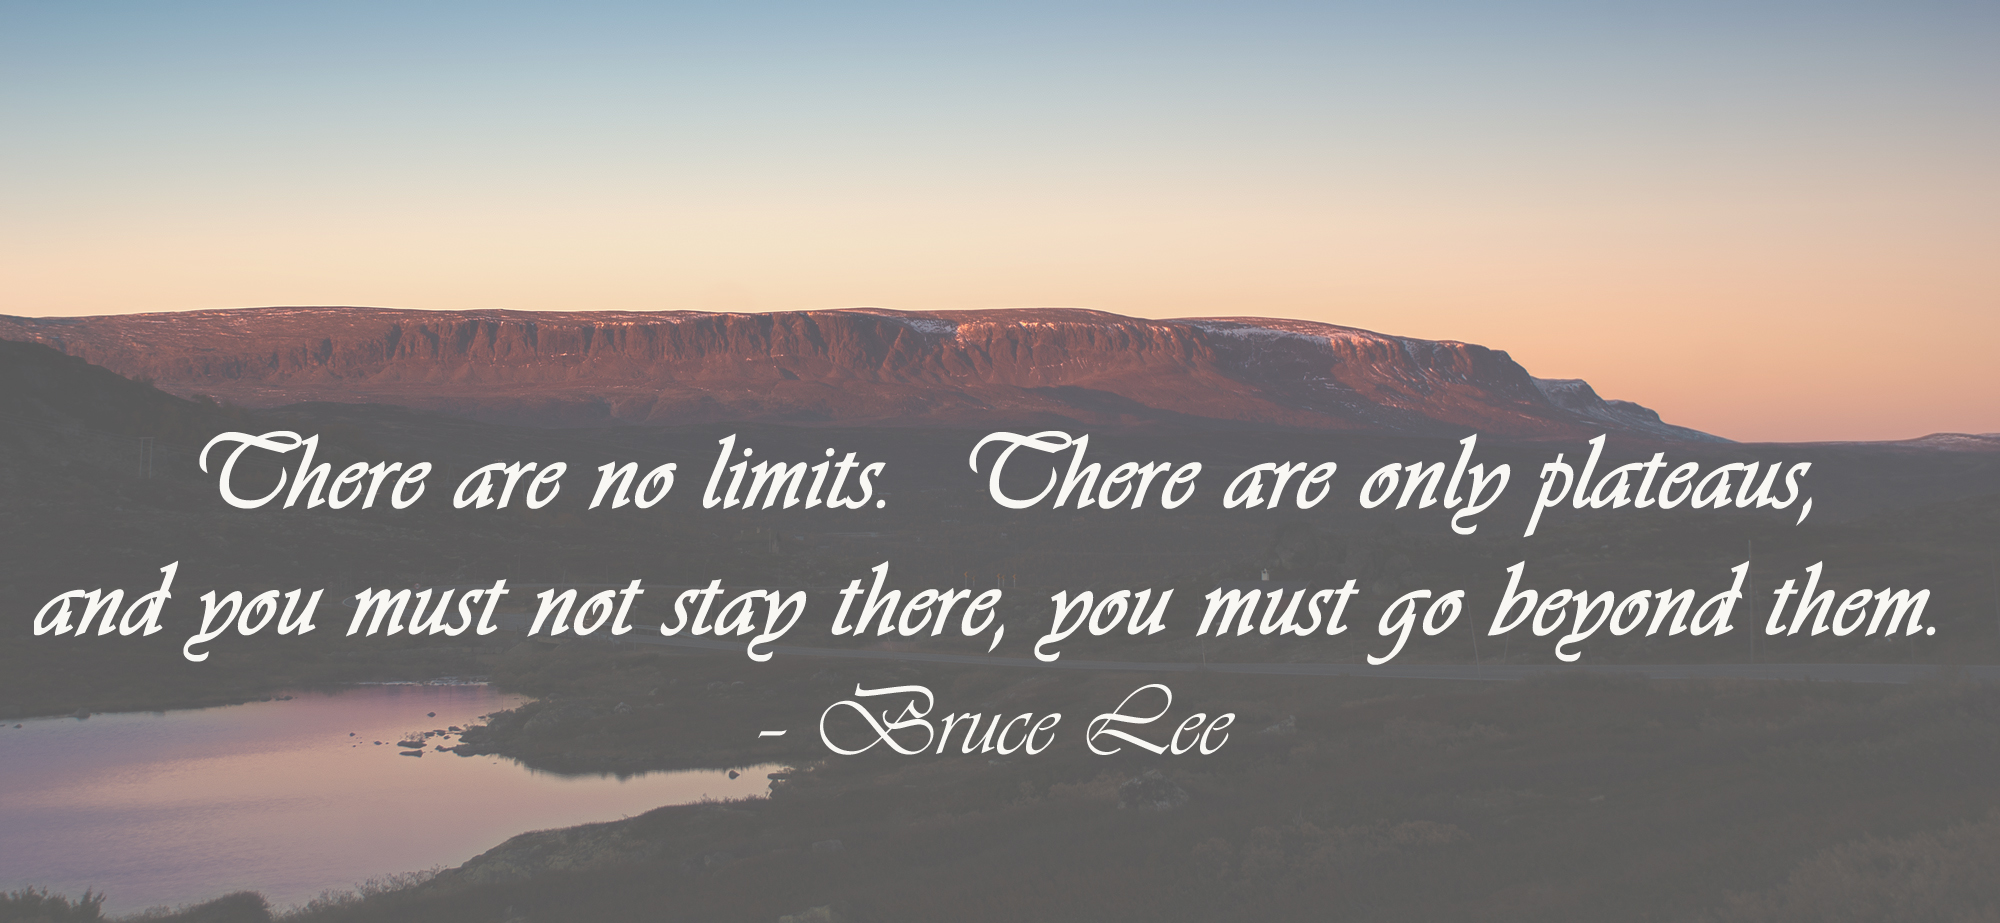 Plateau quote #2